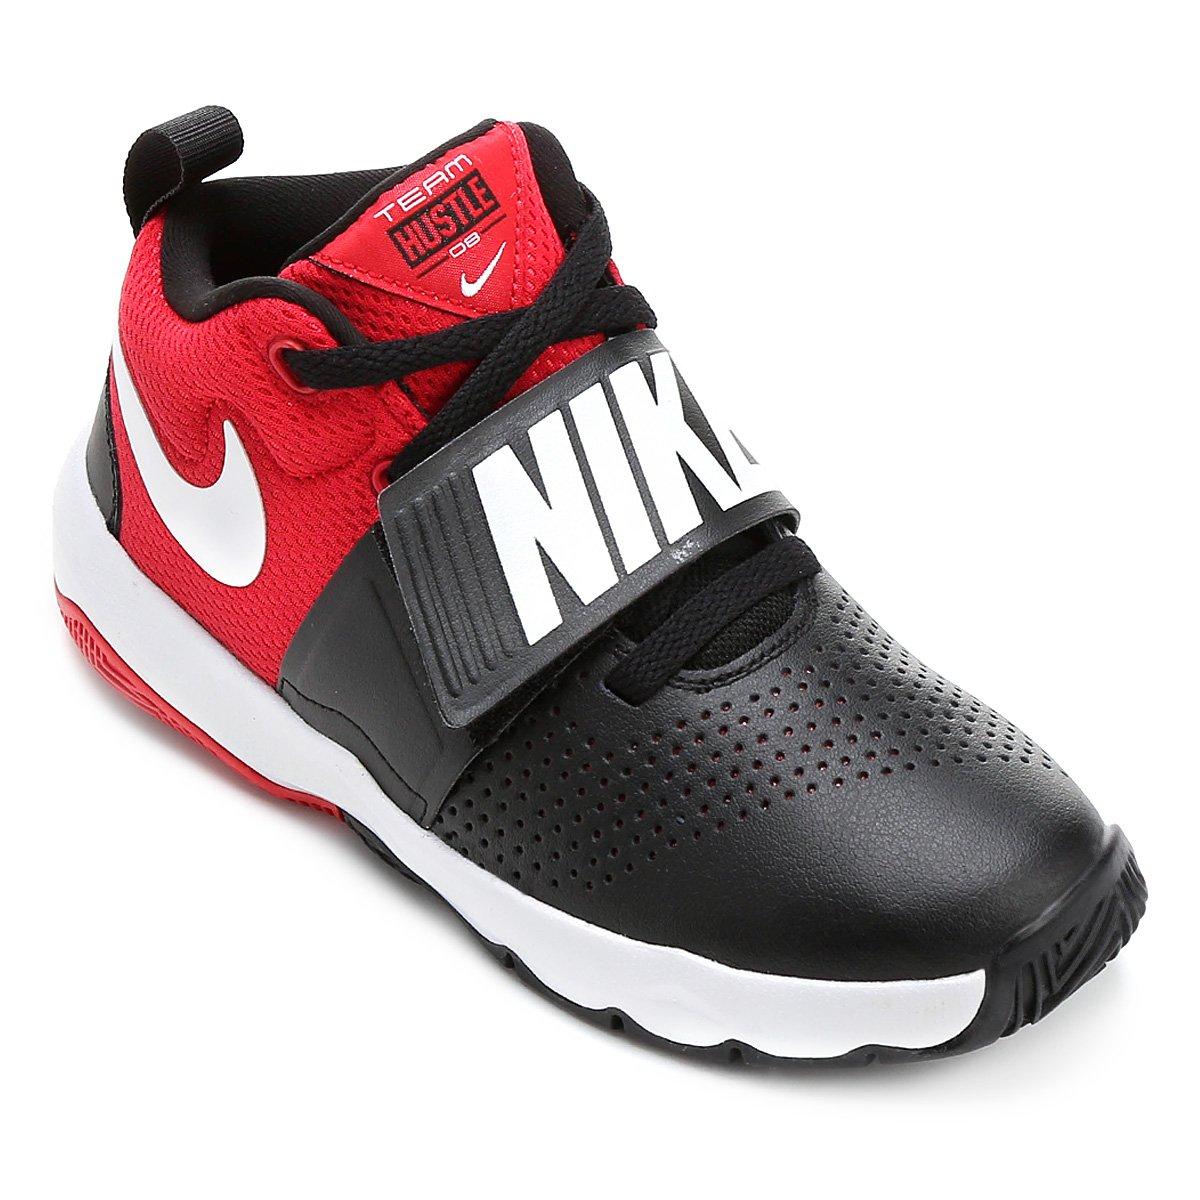 efba1e5dfbb Tênis Infantil Nike Team Hustle D8 Masculino - Compre Agora